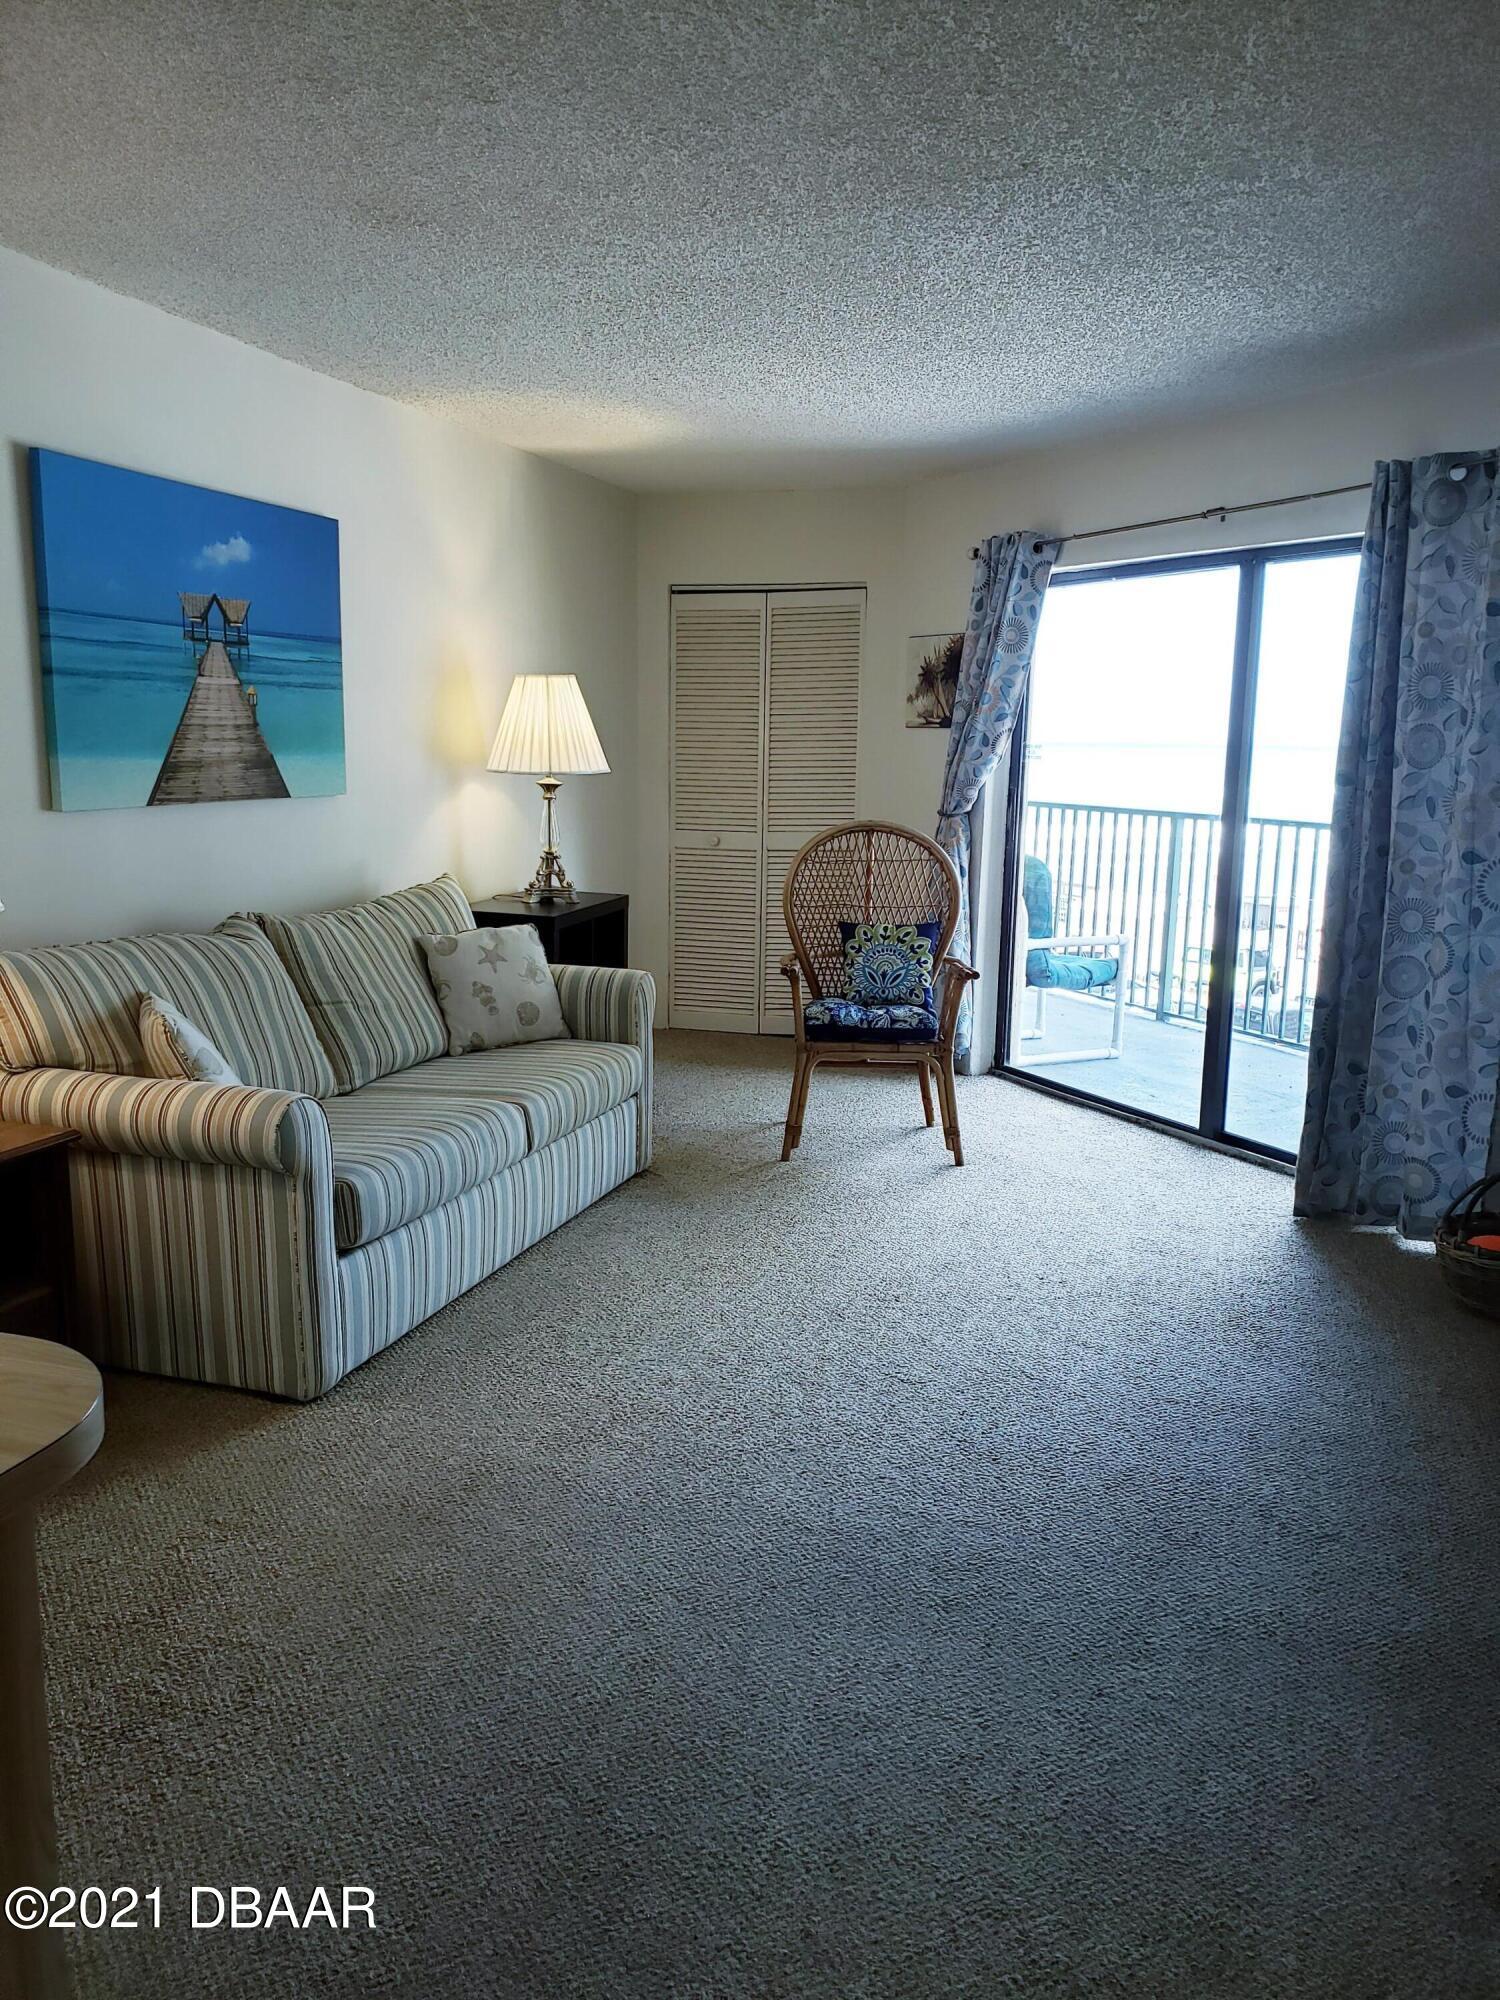 Image 3 of 20 For 3647 Atlantic Avenue 306